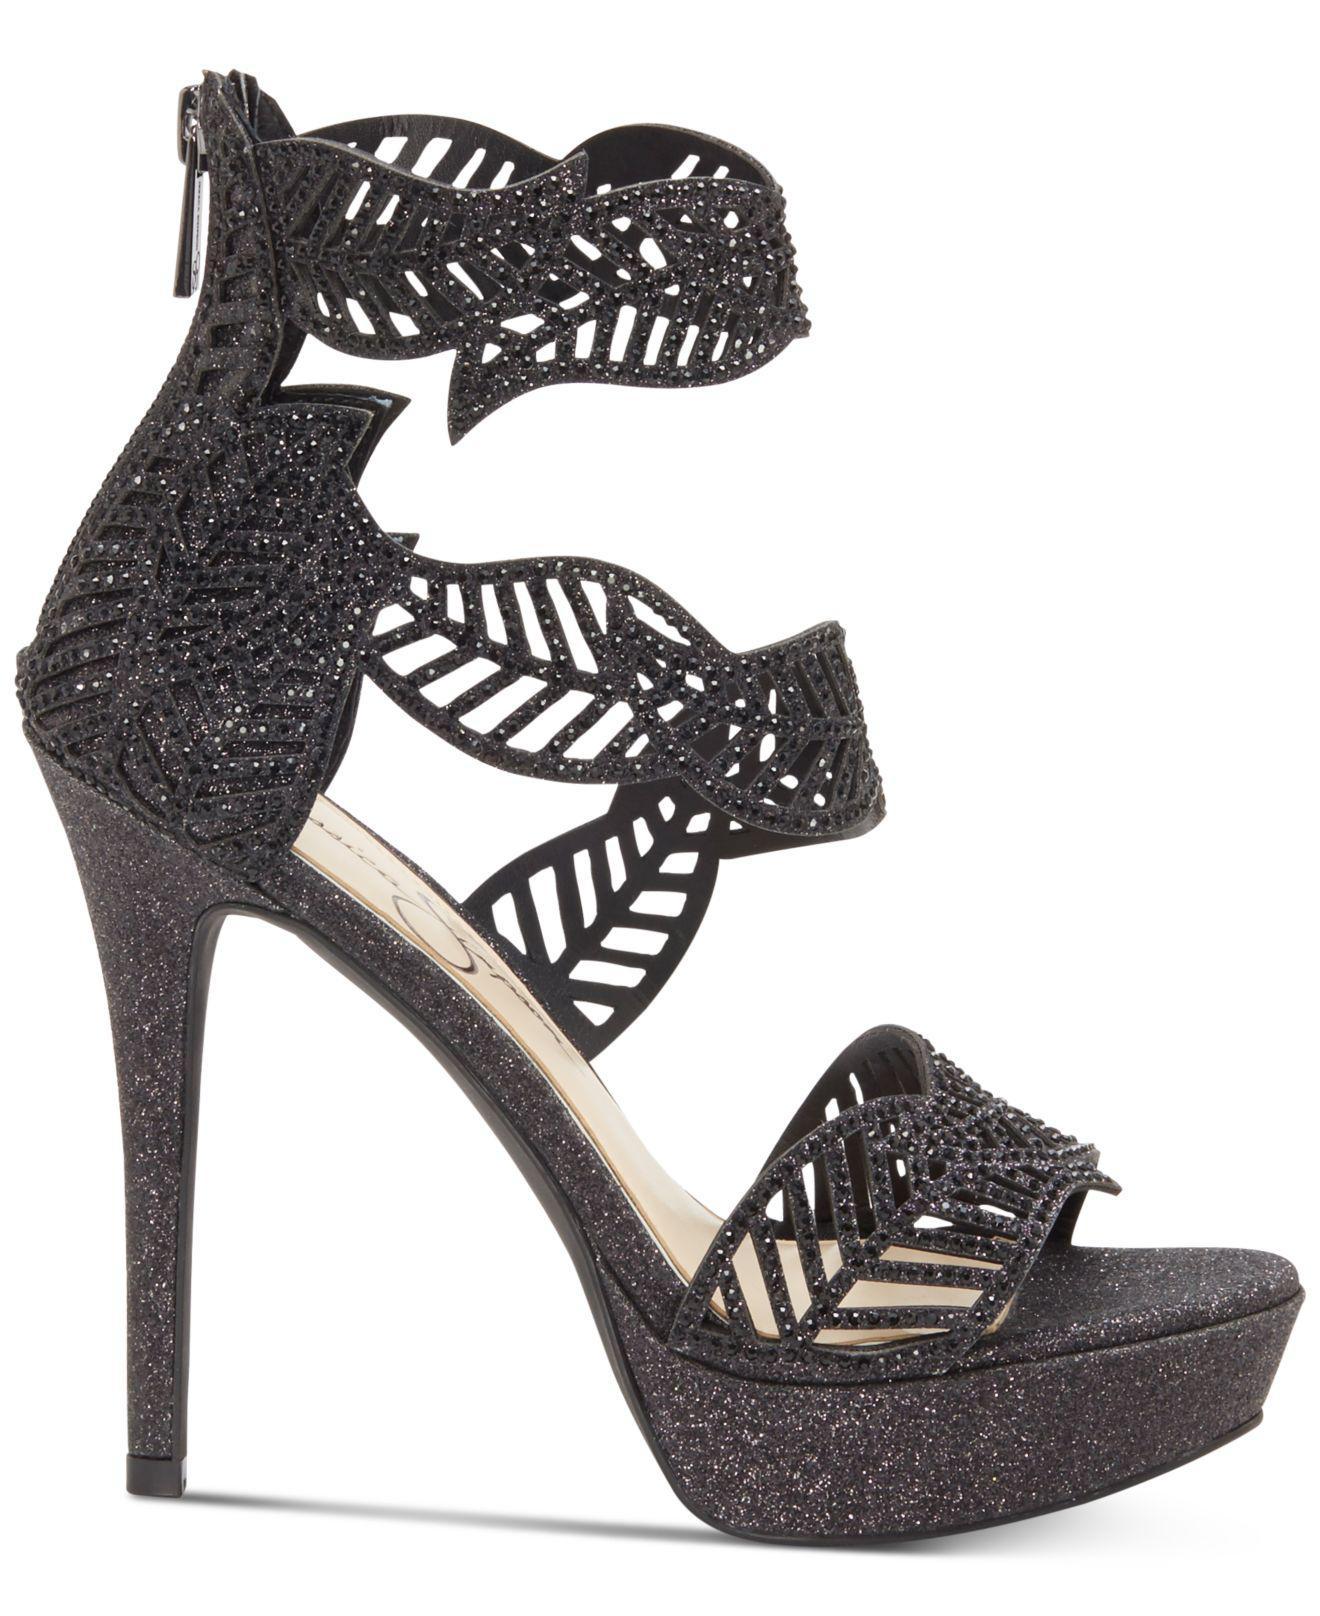 947af19bdbac Lyst - Jessica Simpson Bonilynn Platform Dress Sandals in Black